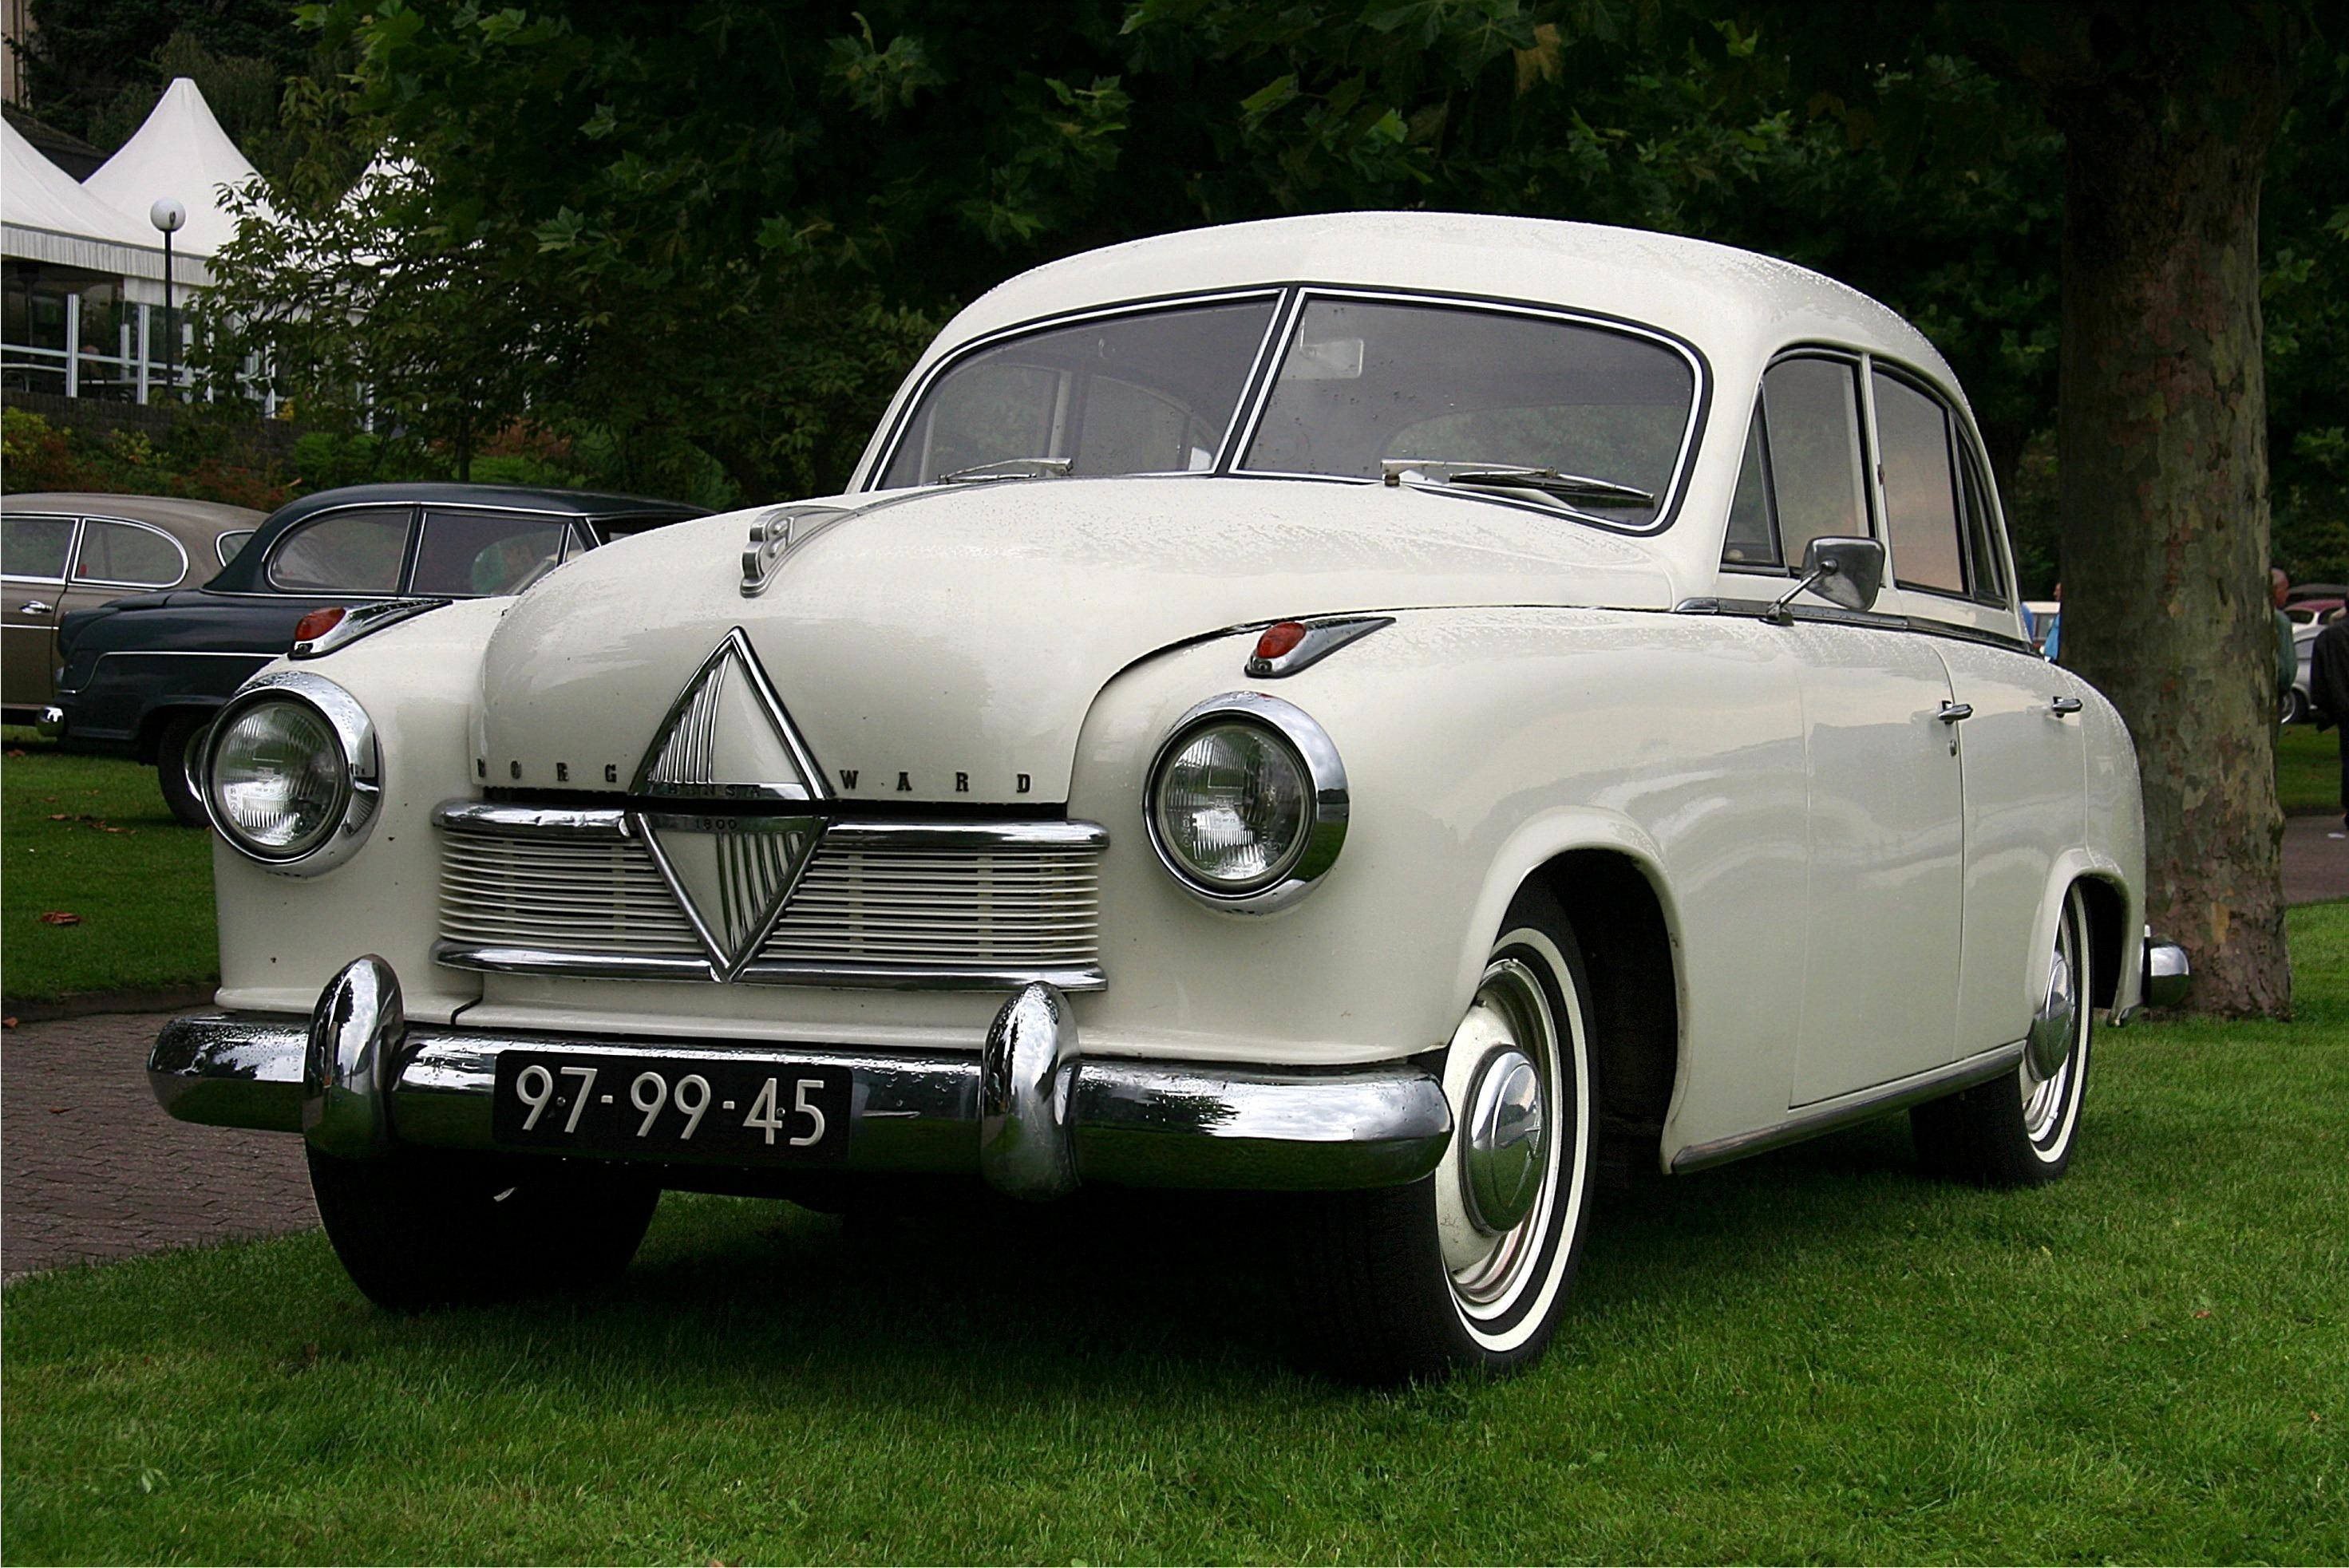 2007-09-08 2581 Borgward Hansa 1800 Front, Bauzeit 1952-1954 (ret2)-1-